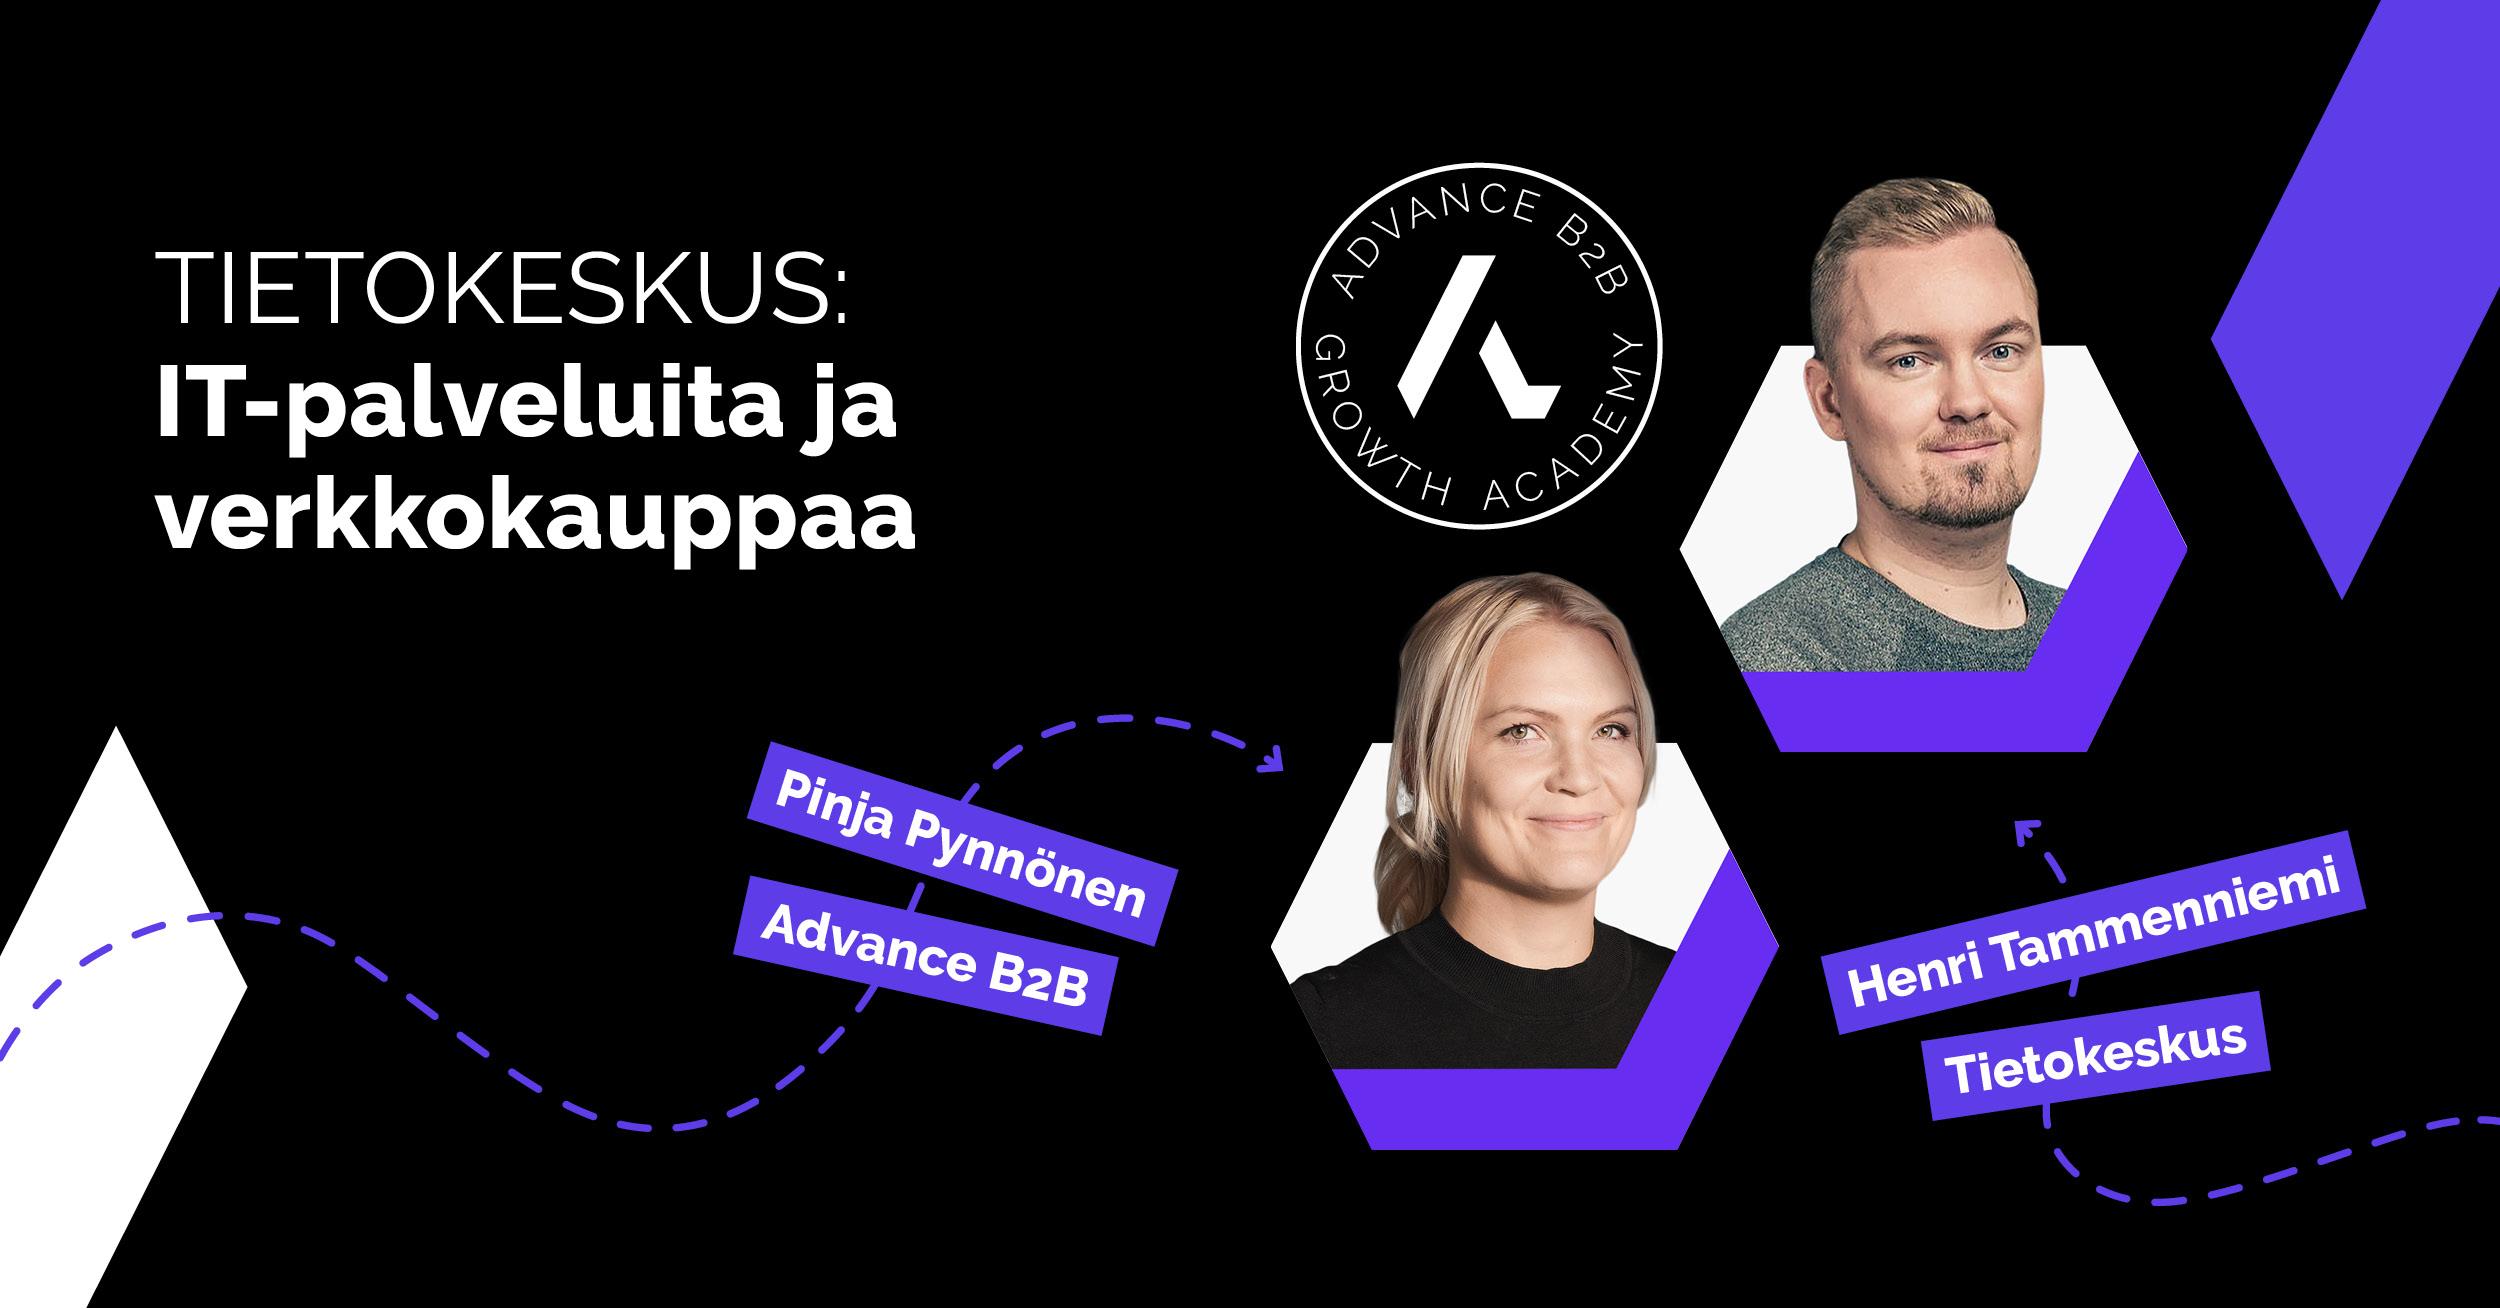 https://tietopankki.advanceb2b.com/hubfs/social-suggested-images/Growth_Academy-Season2-Tietokeskus-LI-2%20%281%29.jpg